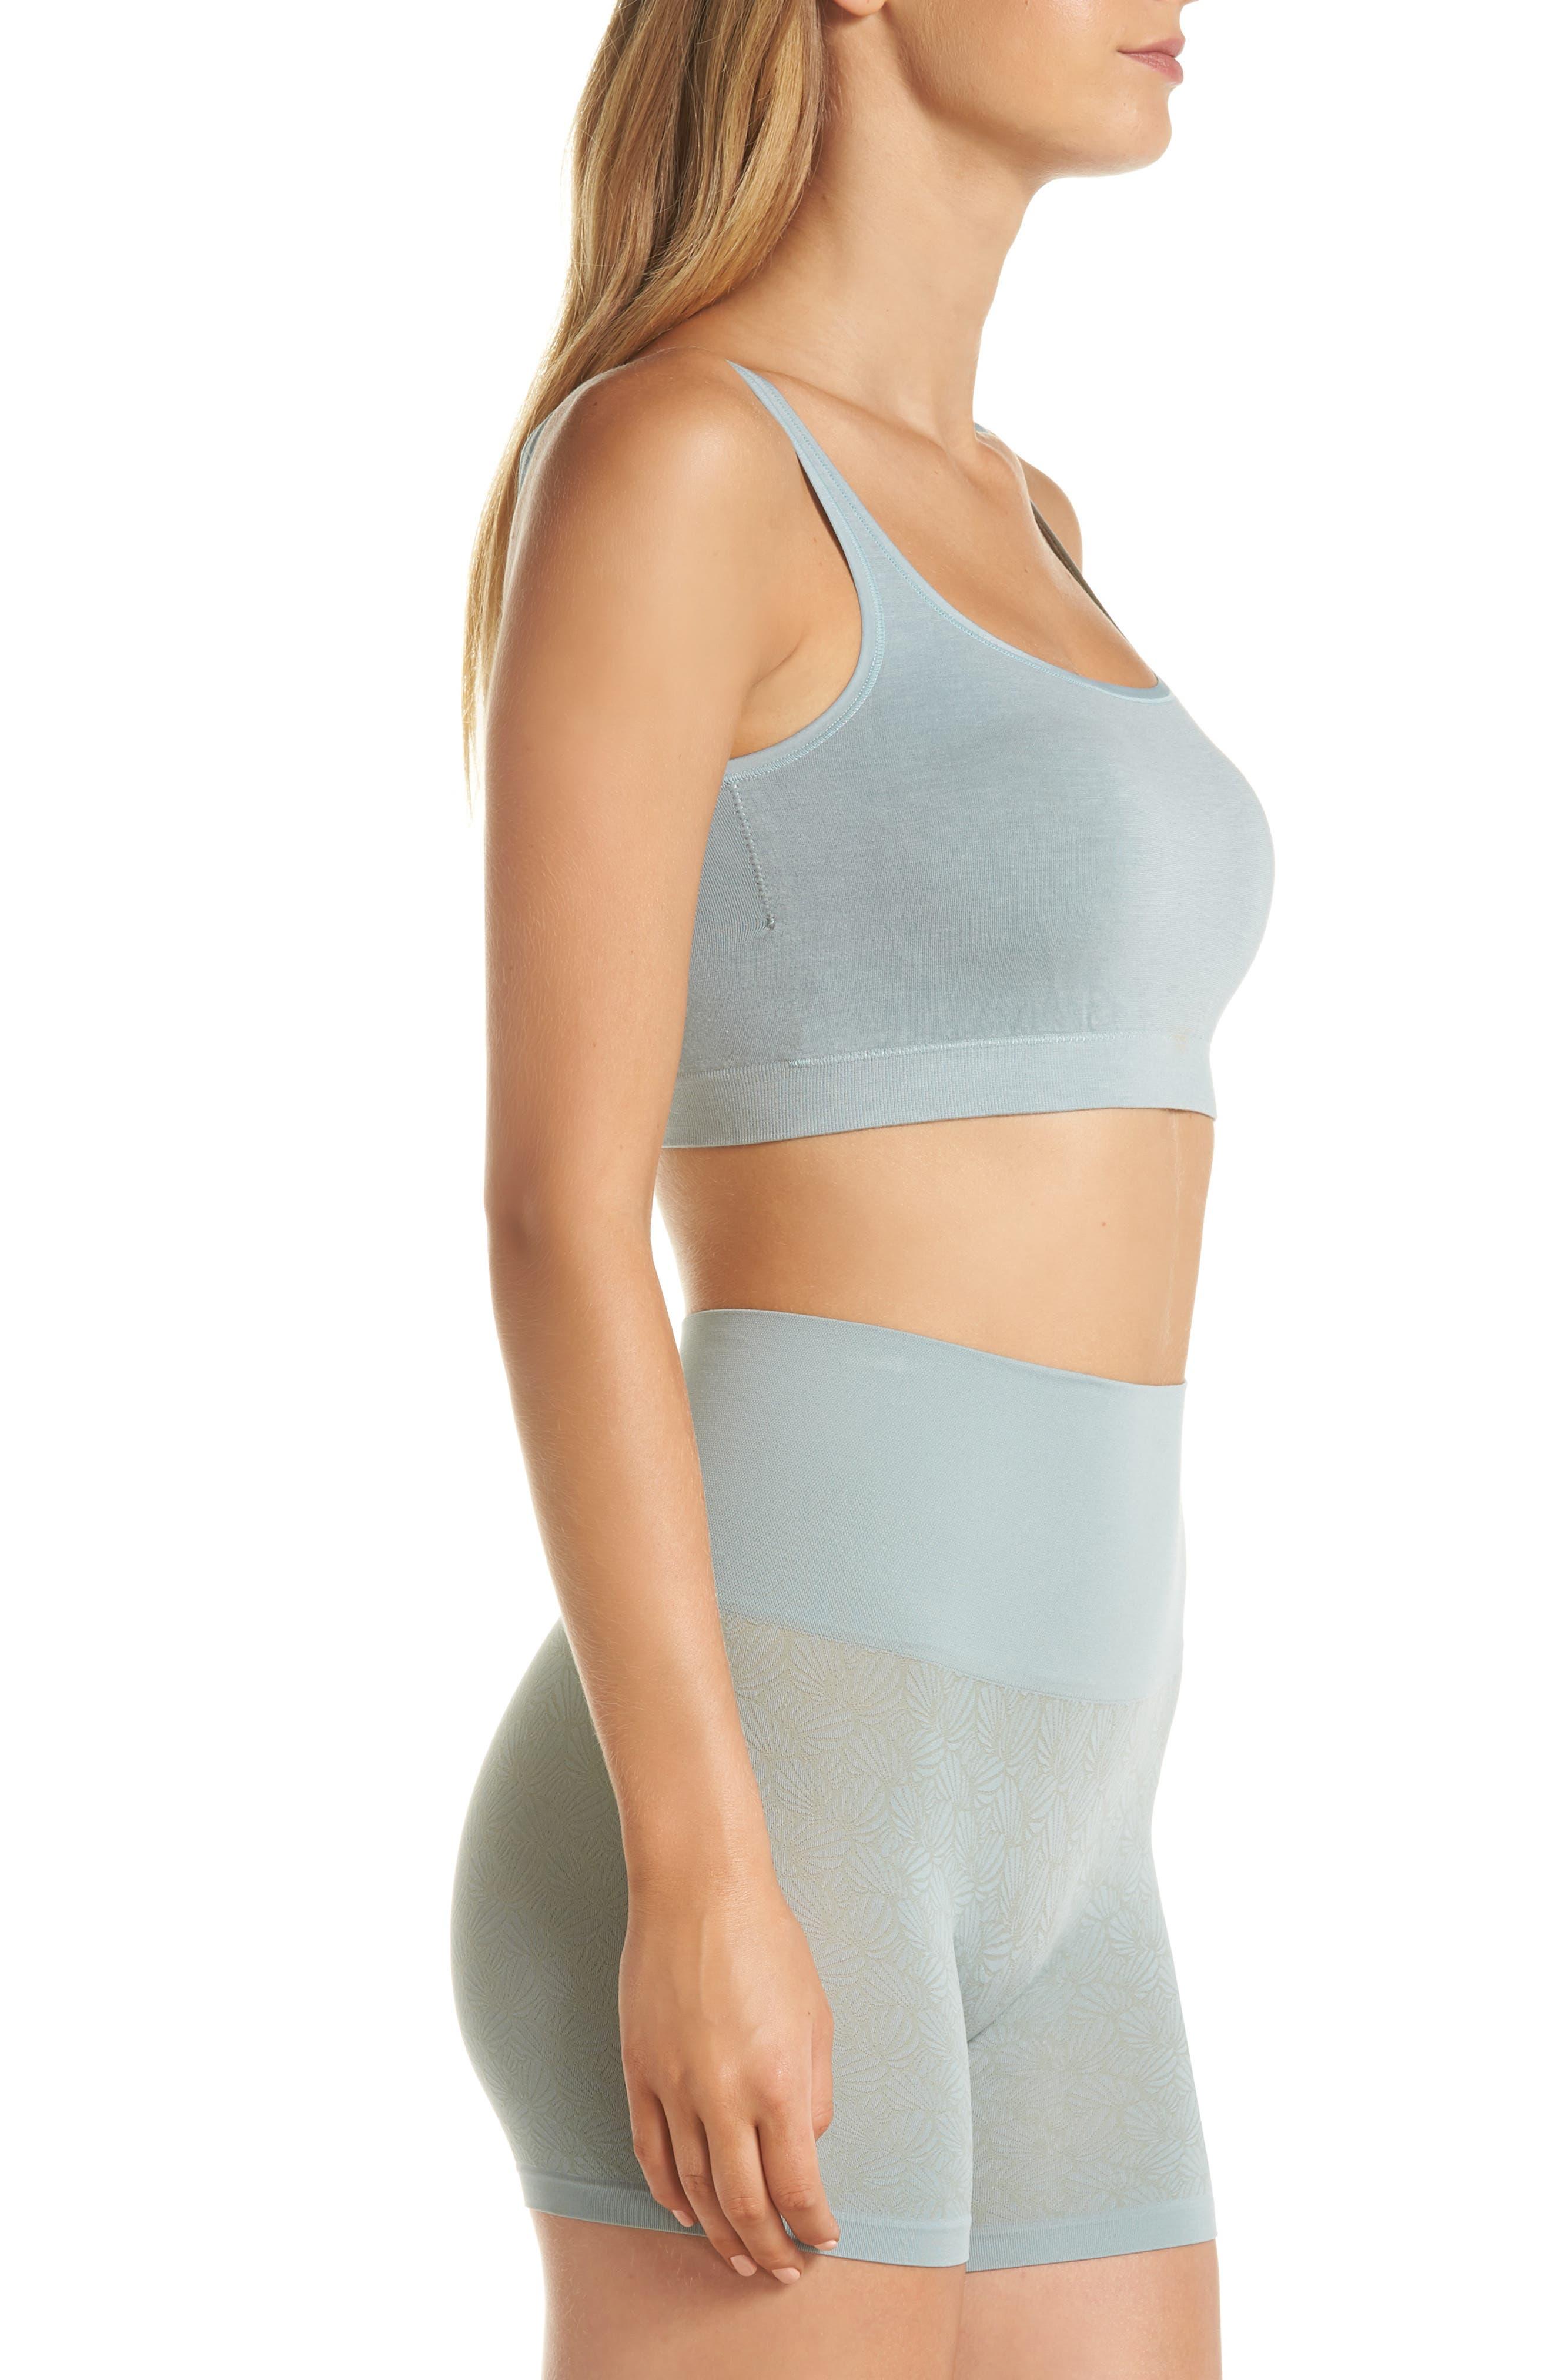 Ultralight Seamless Shaping Shorts,                             Alternate thumbnail 9, color,                             SILVER BLUE